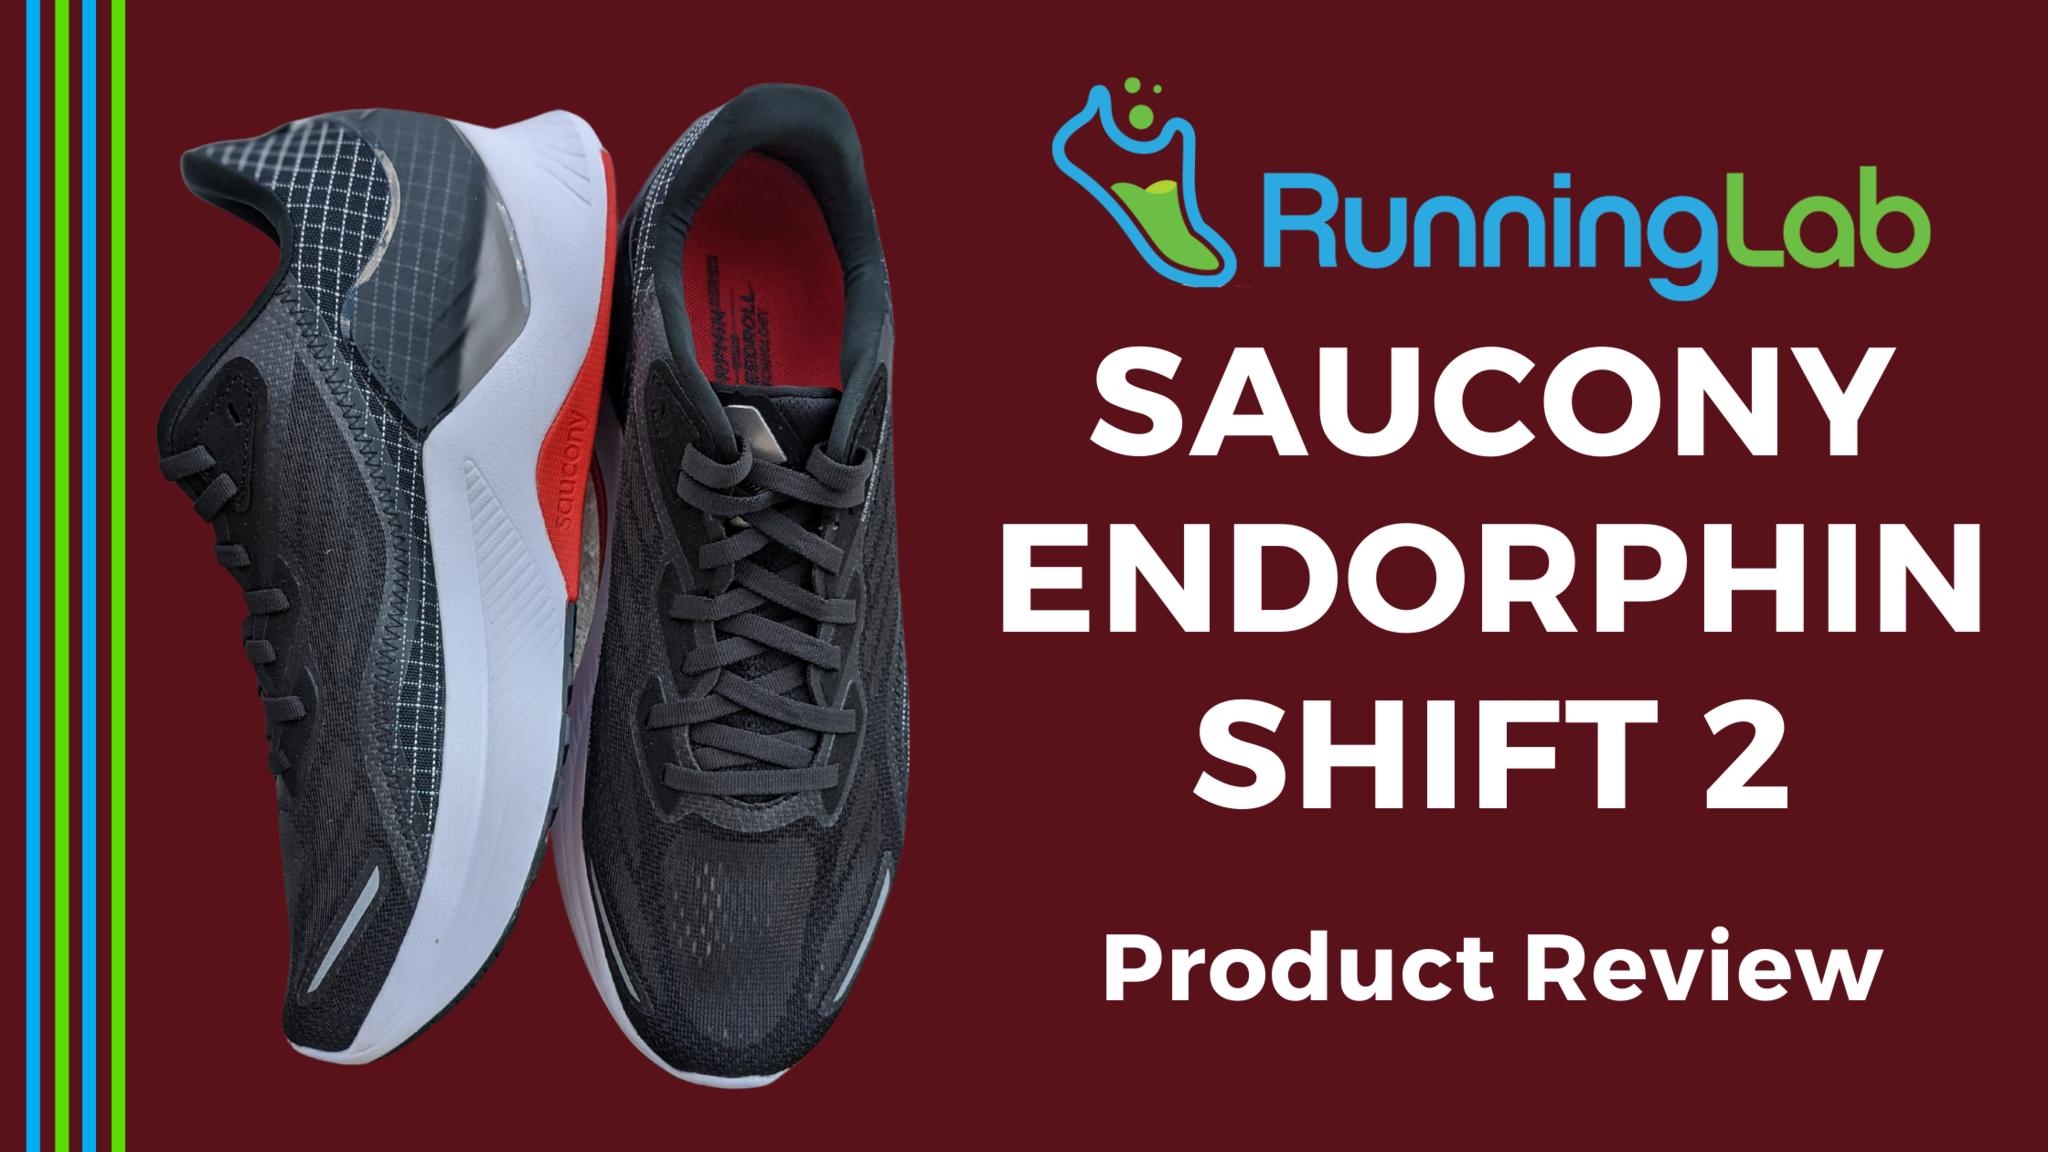 Saucony Endorphin Shift 2